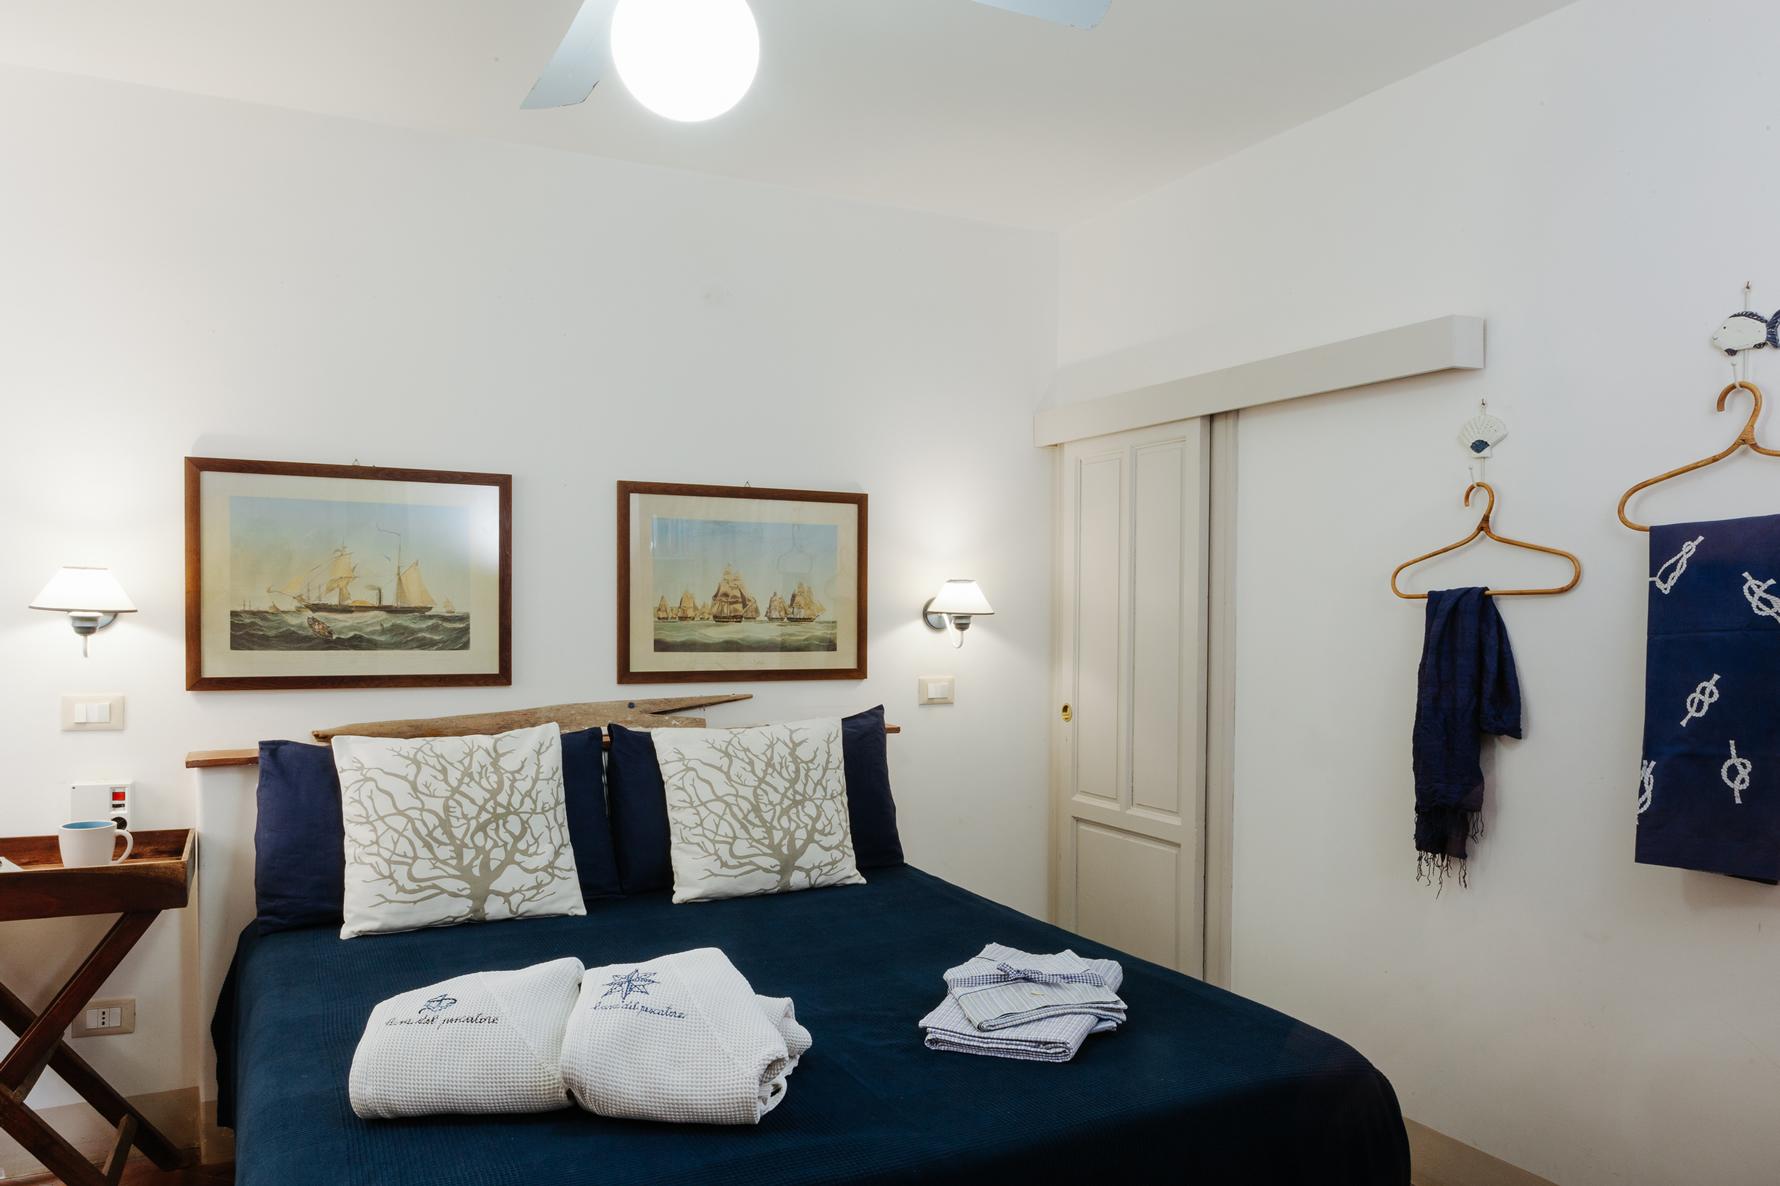 9sampieri-casa-vacanze-sicilia-appartamento-sicily-holiday-apartment-casa-del-pescatore-italia-italy.jpg